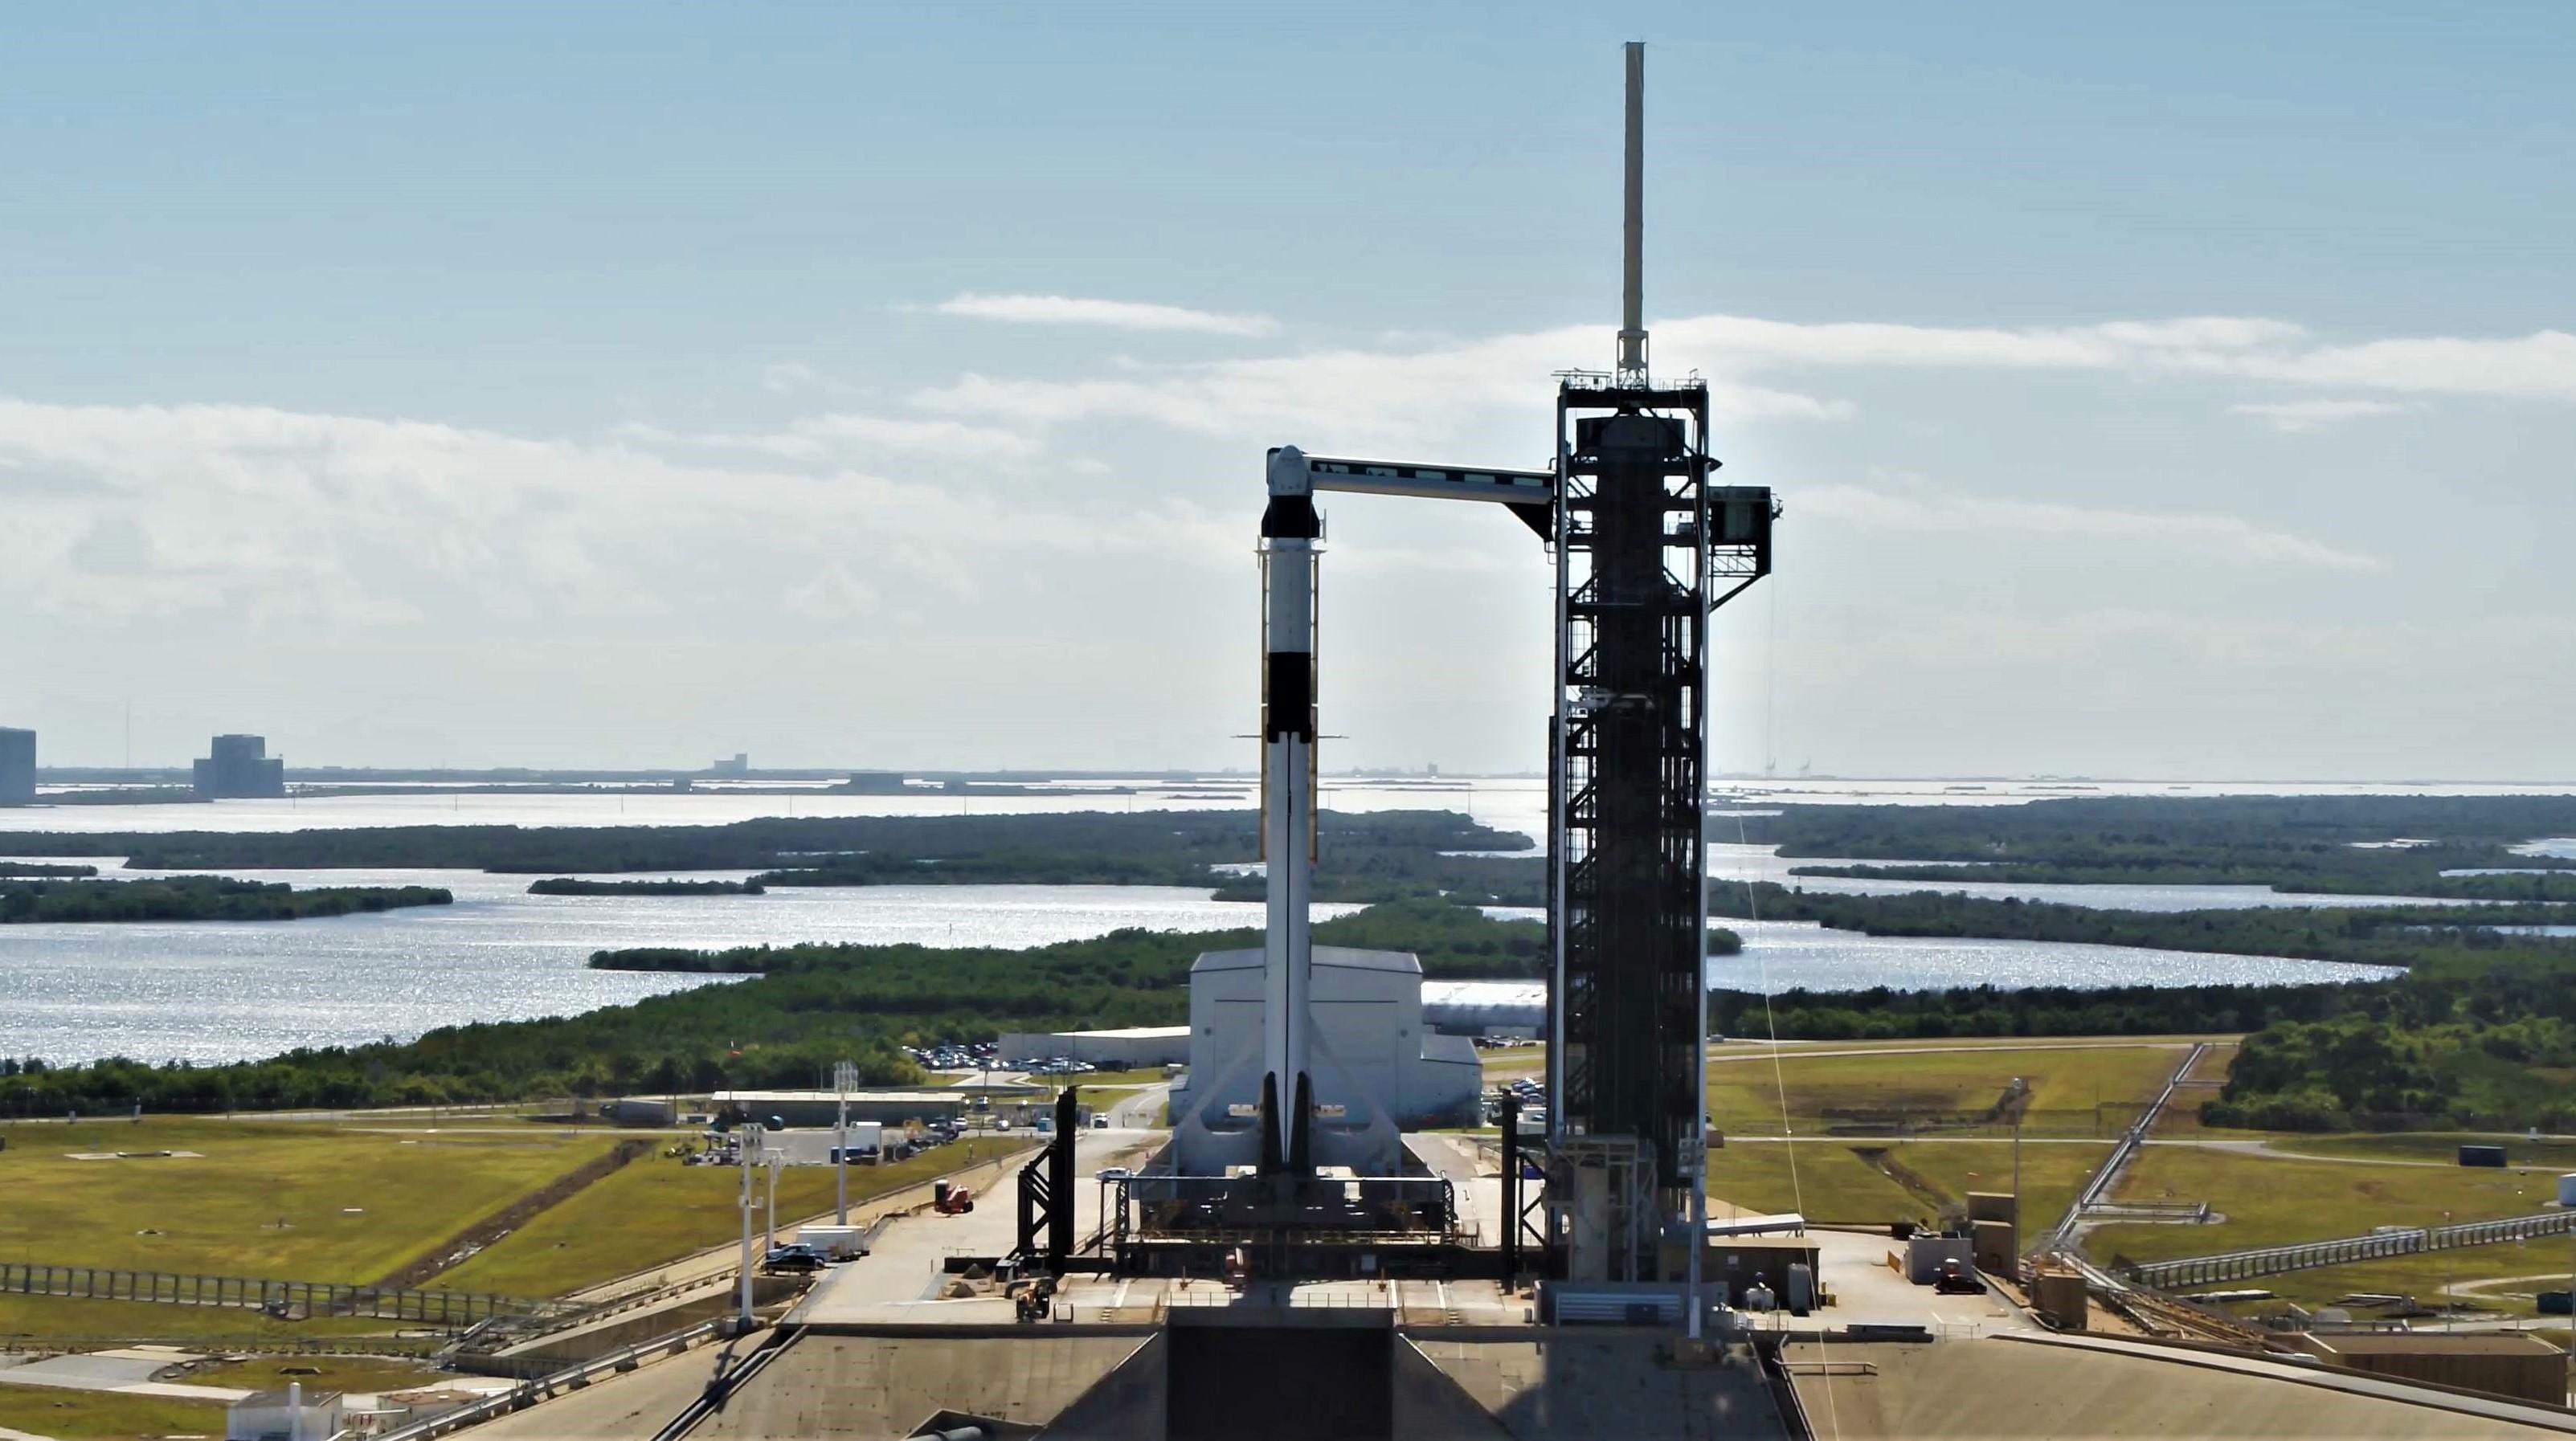 Crew Dragon Falcon 9 DM-1 vertical 39A (SpaceX) 16